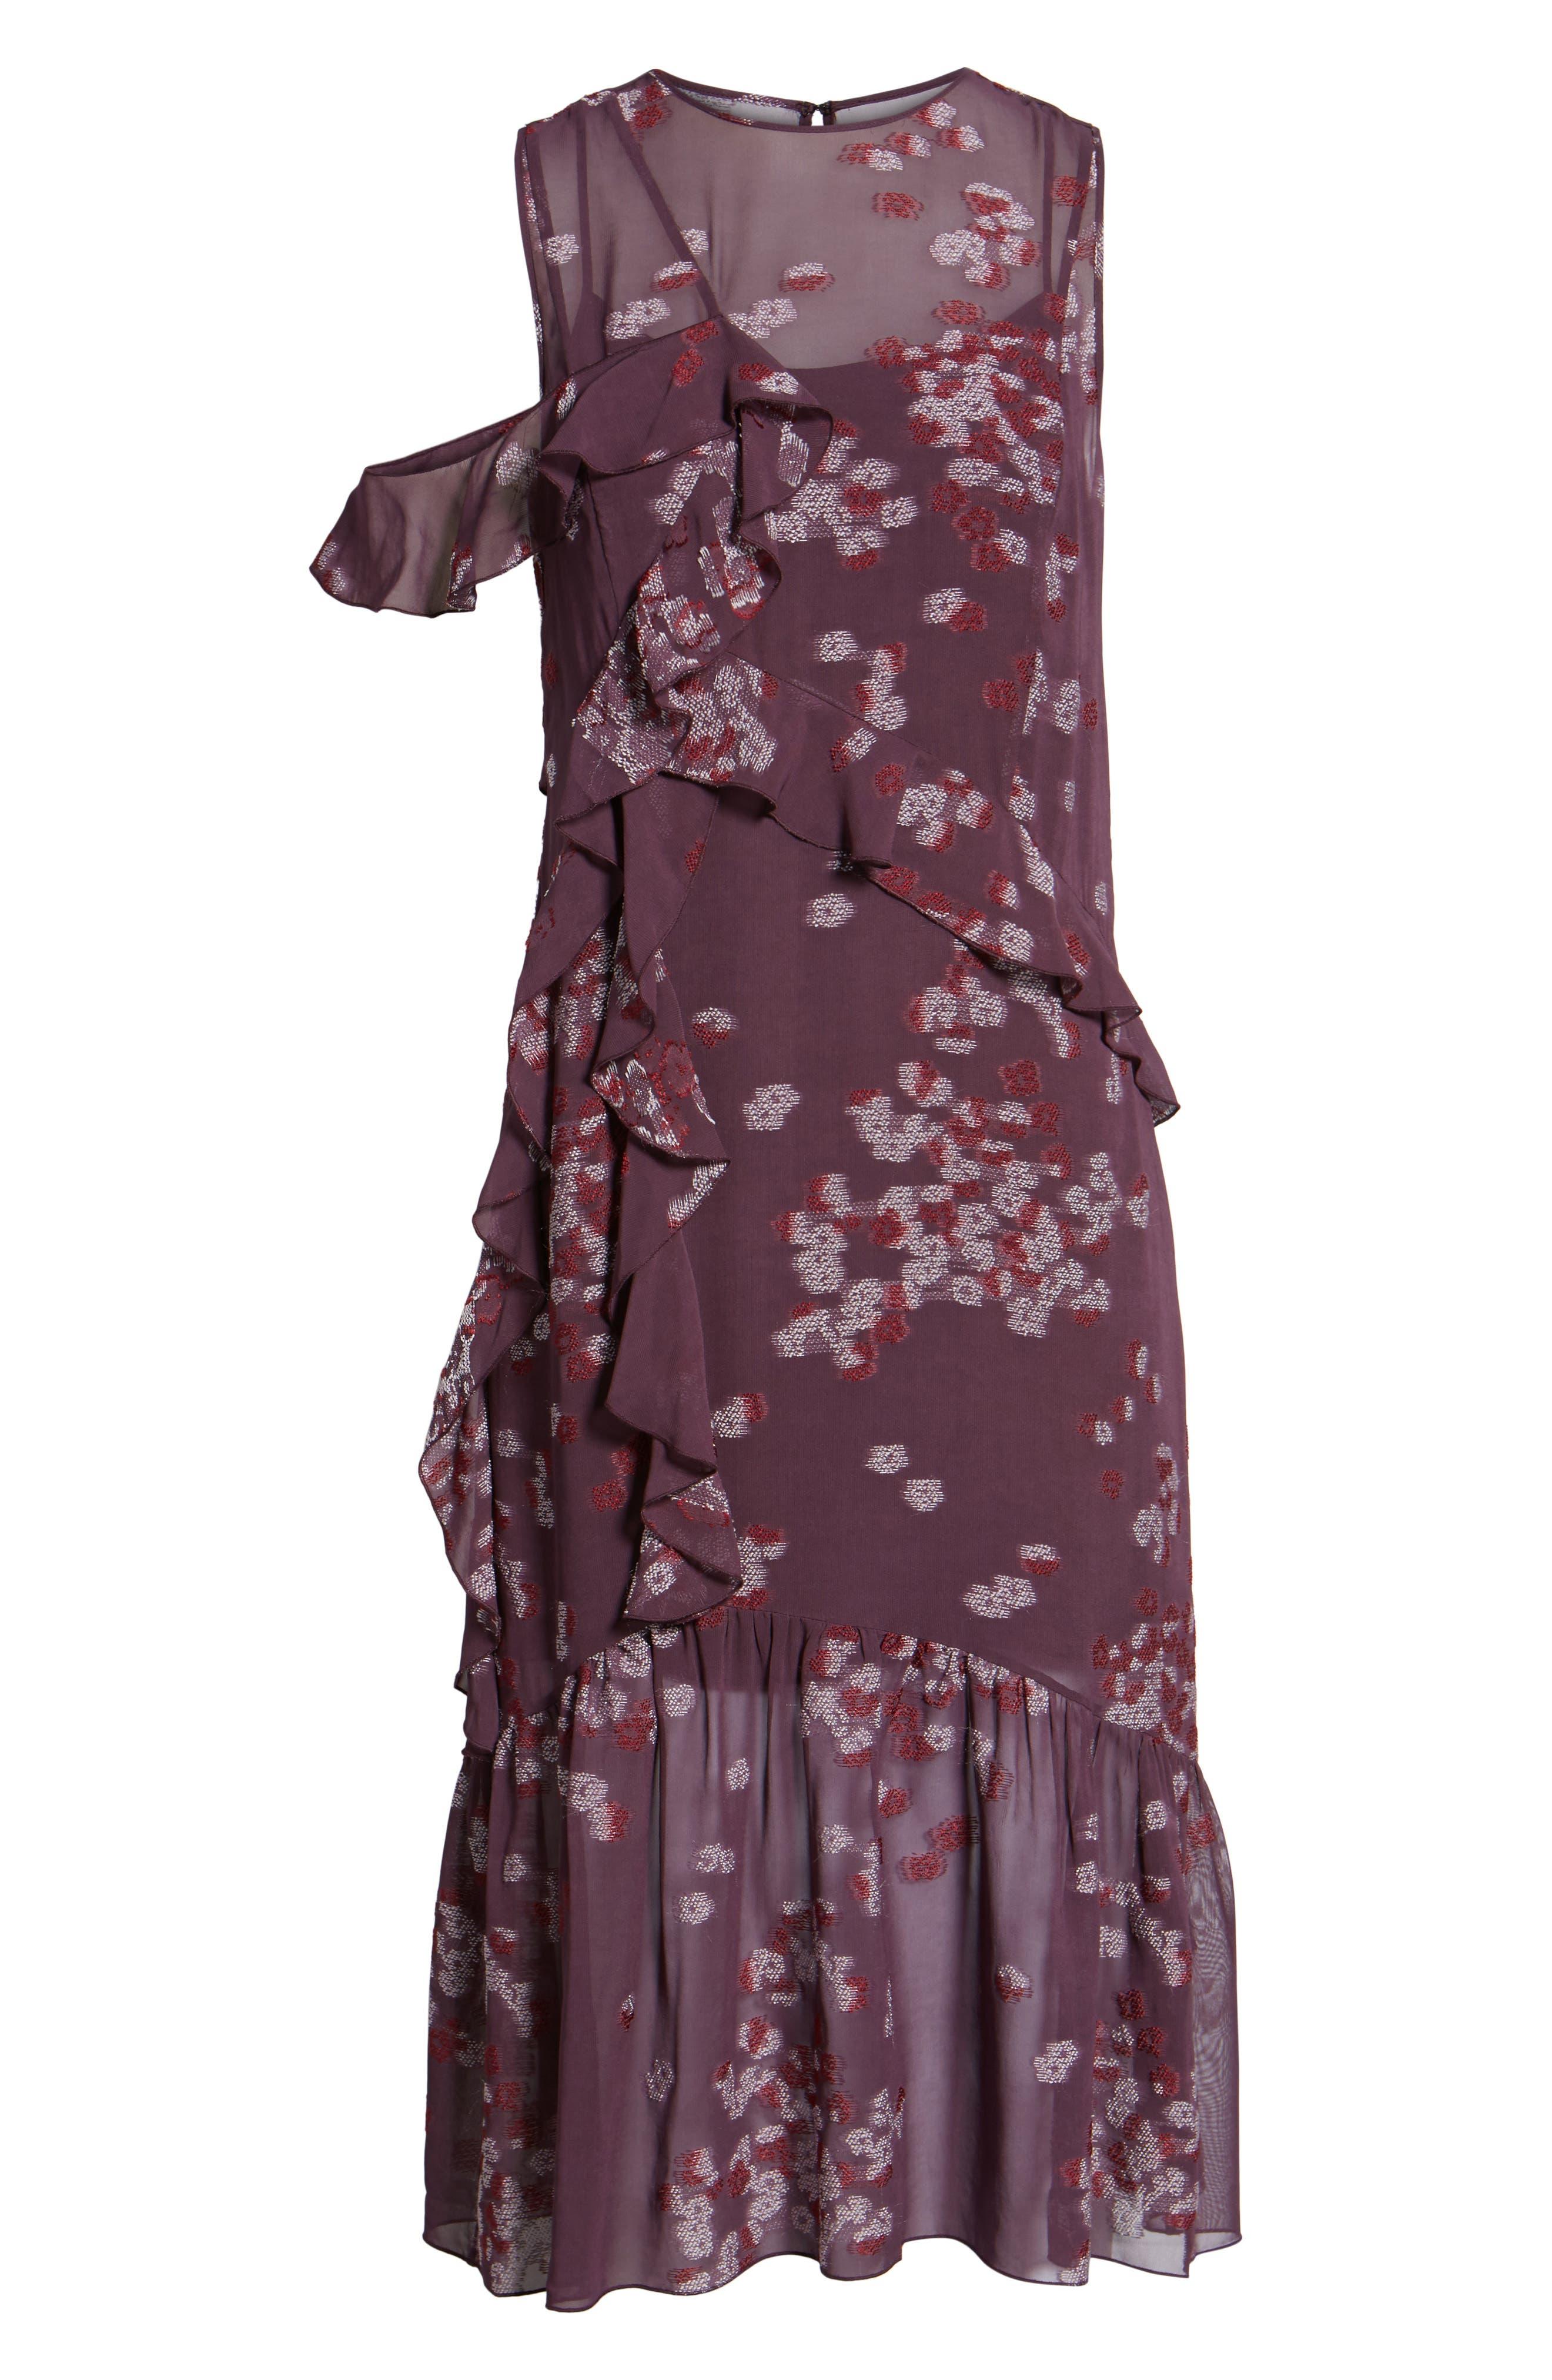 Jacquard Ruffle Dress,                             Alternate thumbnail 6, color,                             Purple Plum Scattered Floral